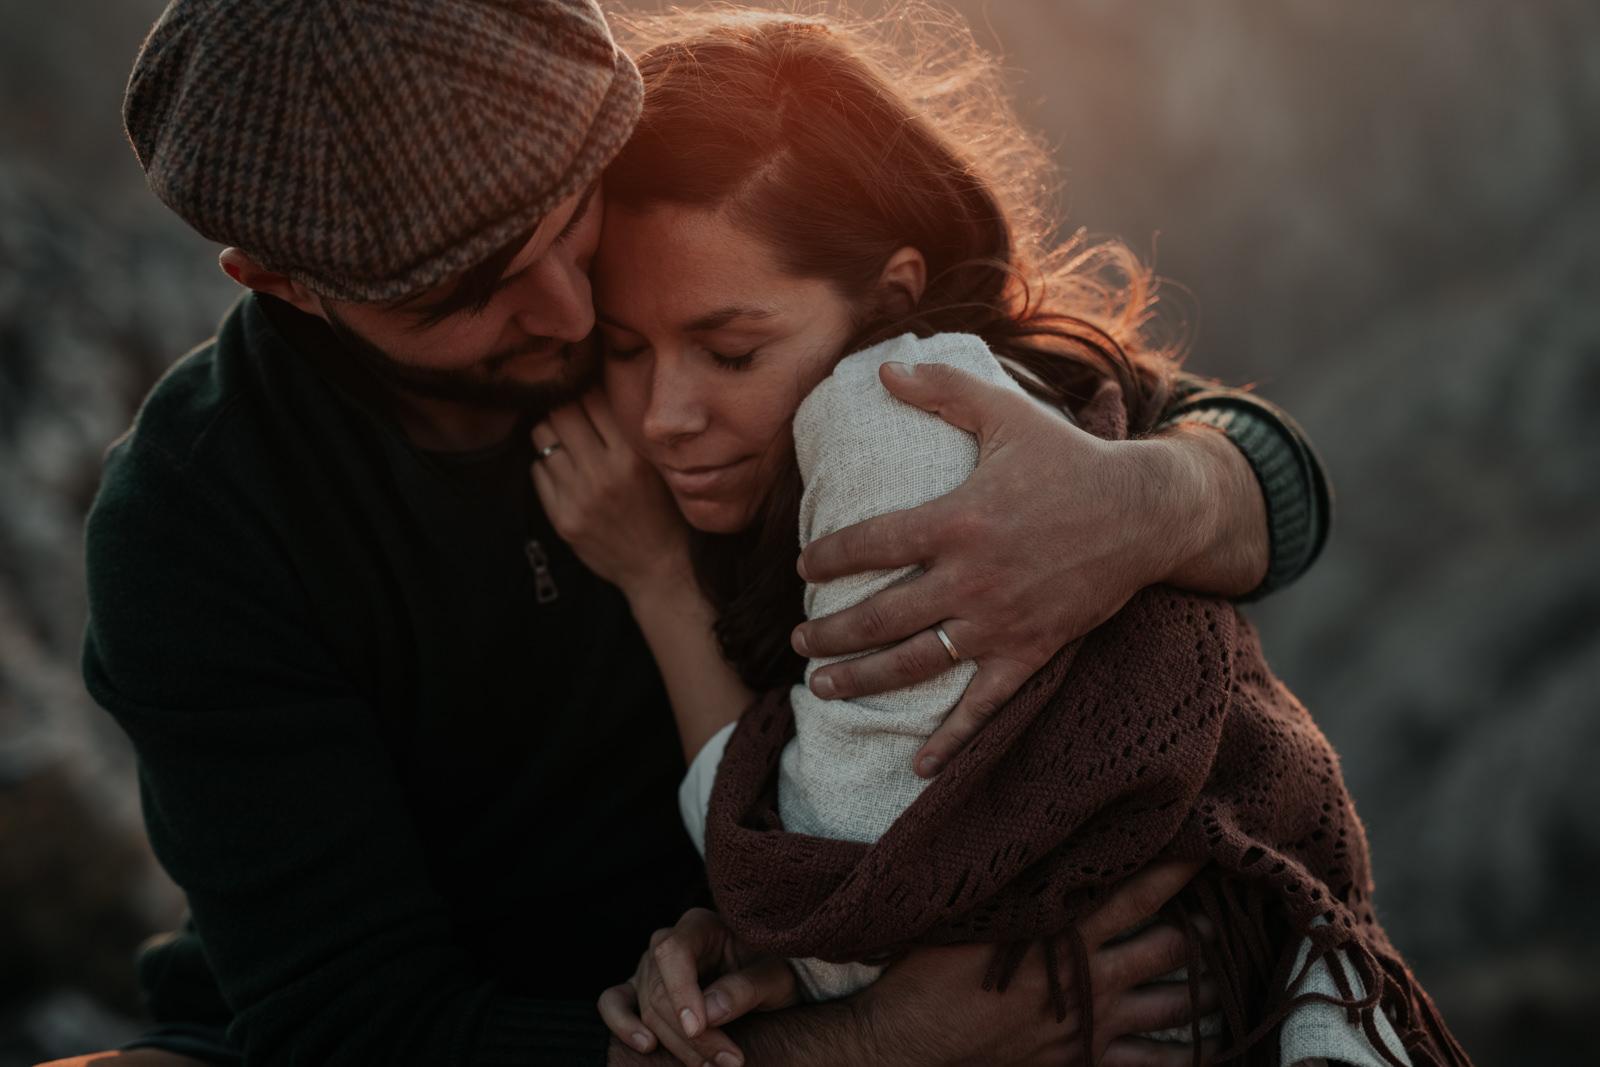 Bianca and Jonut in Transylvania by Lily Vasian